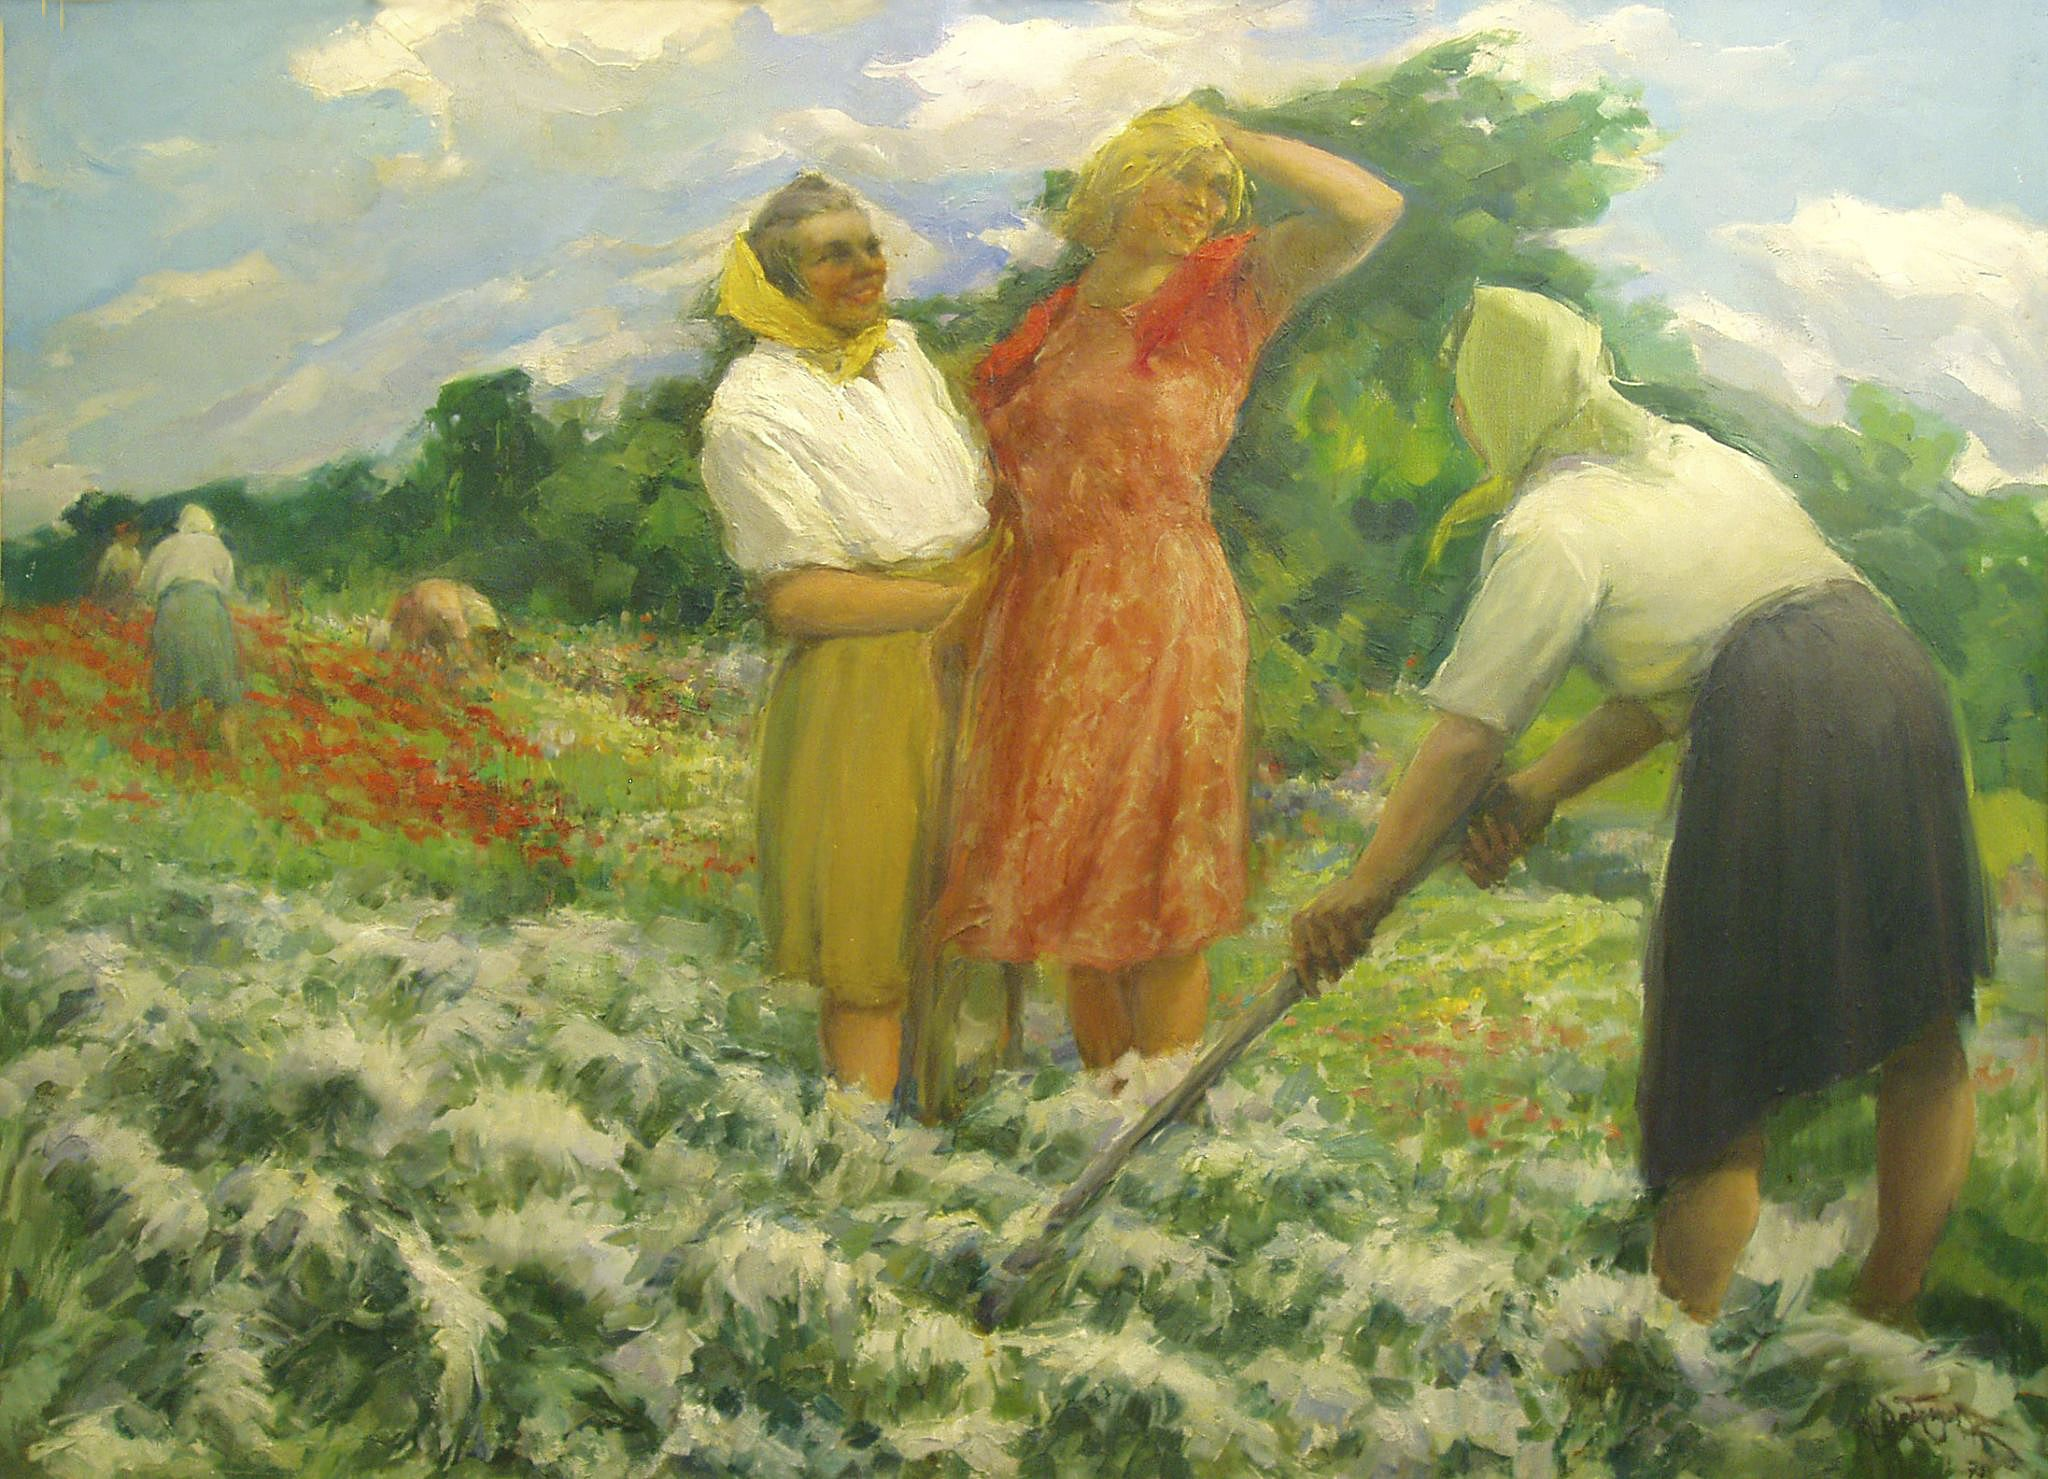 Михайло Добронравов. Робота в полі, 1975; полотно, олія